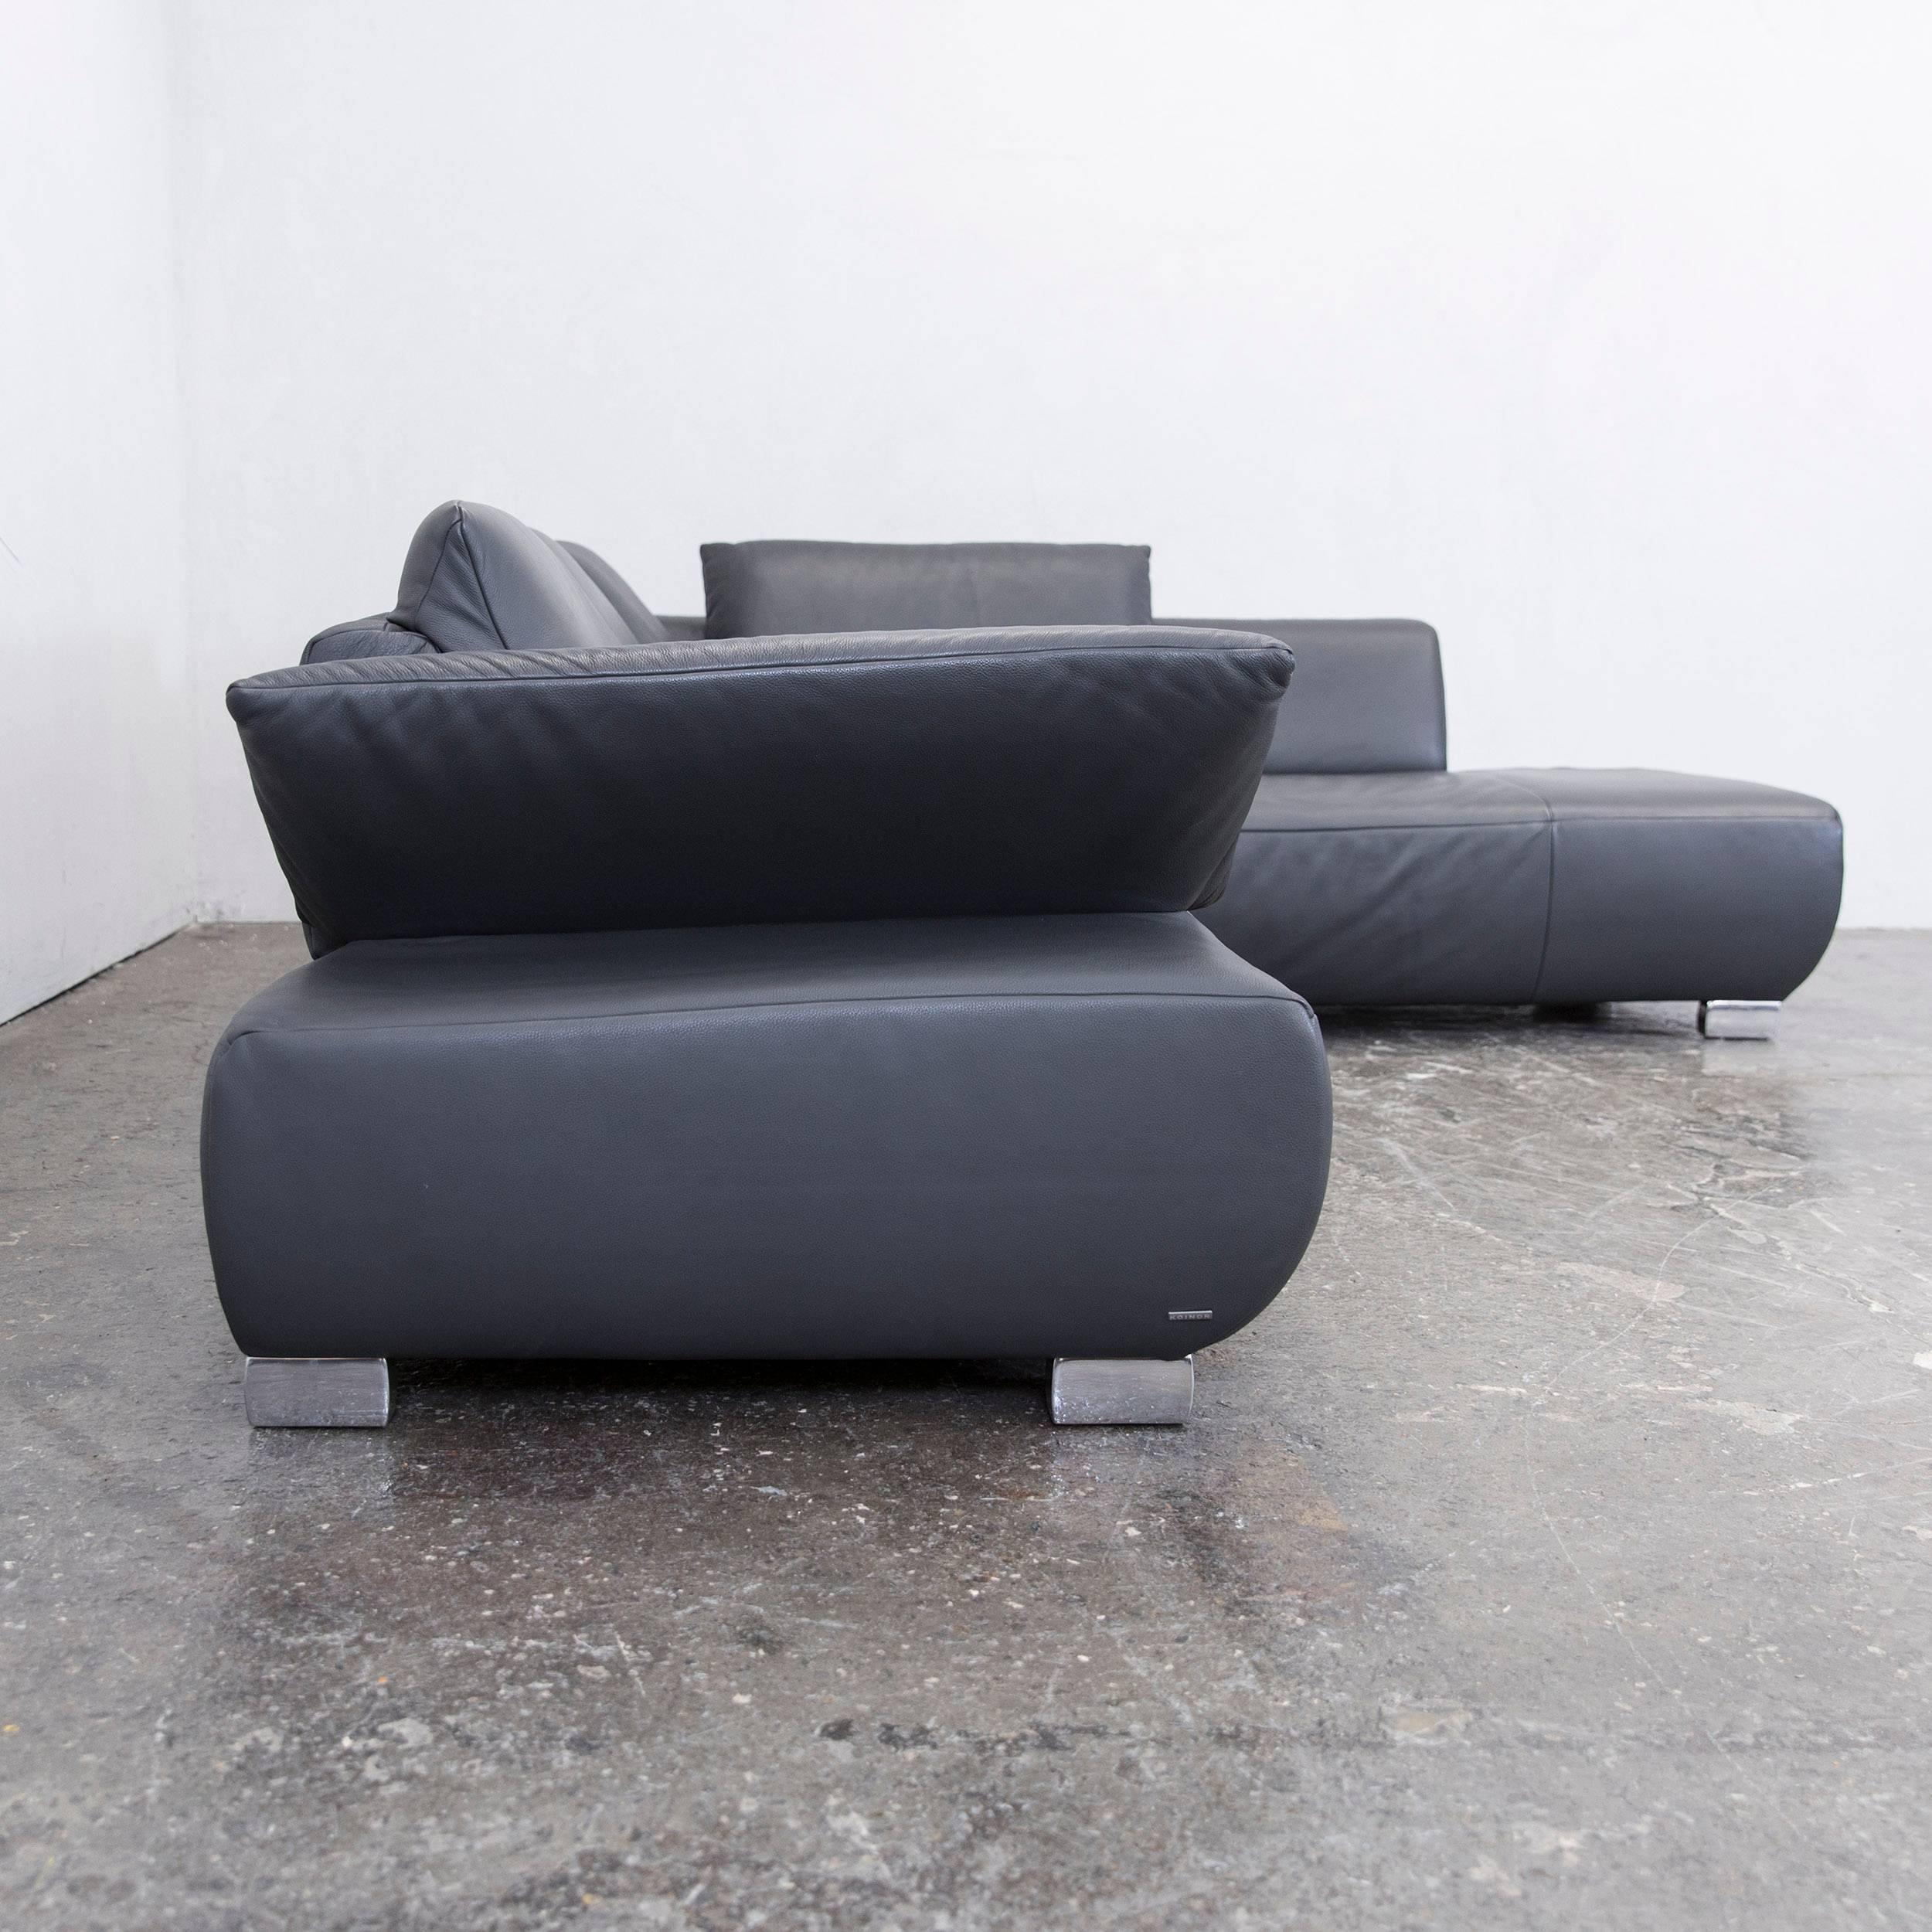 ecksofa koinor awesome free koinor raoul designer ecksofa garnitur leder braun hocker with. Black Bedroom Furniture Sets. Home Design Ideas